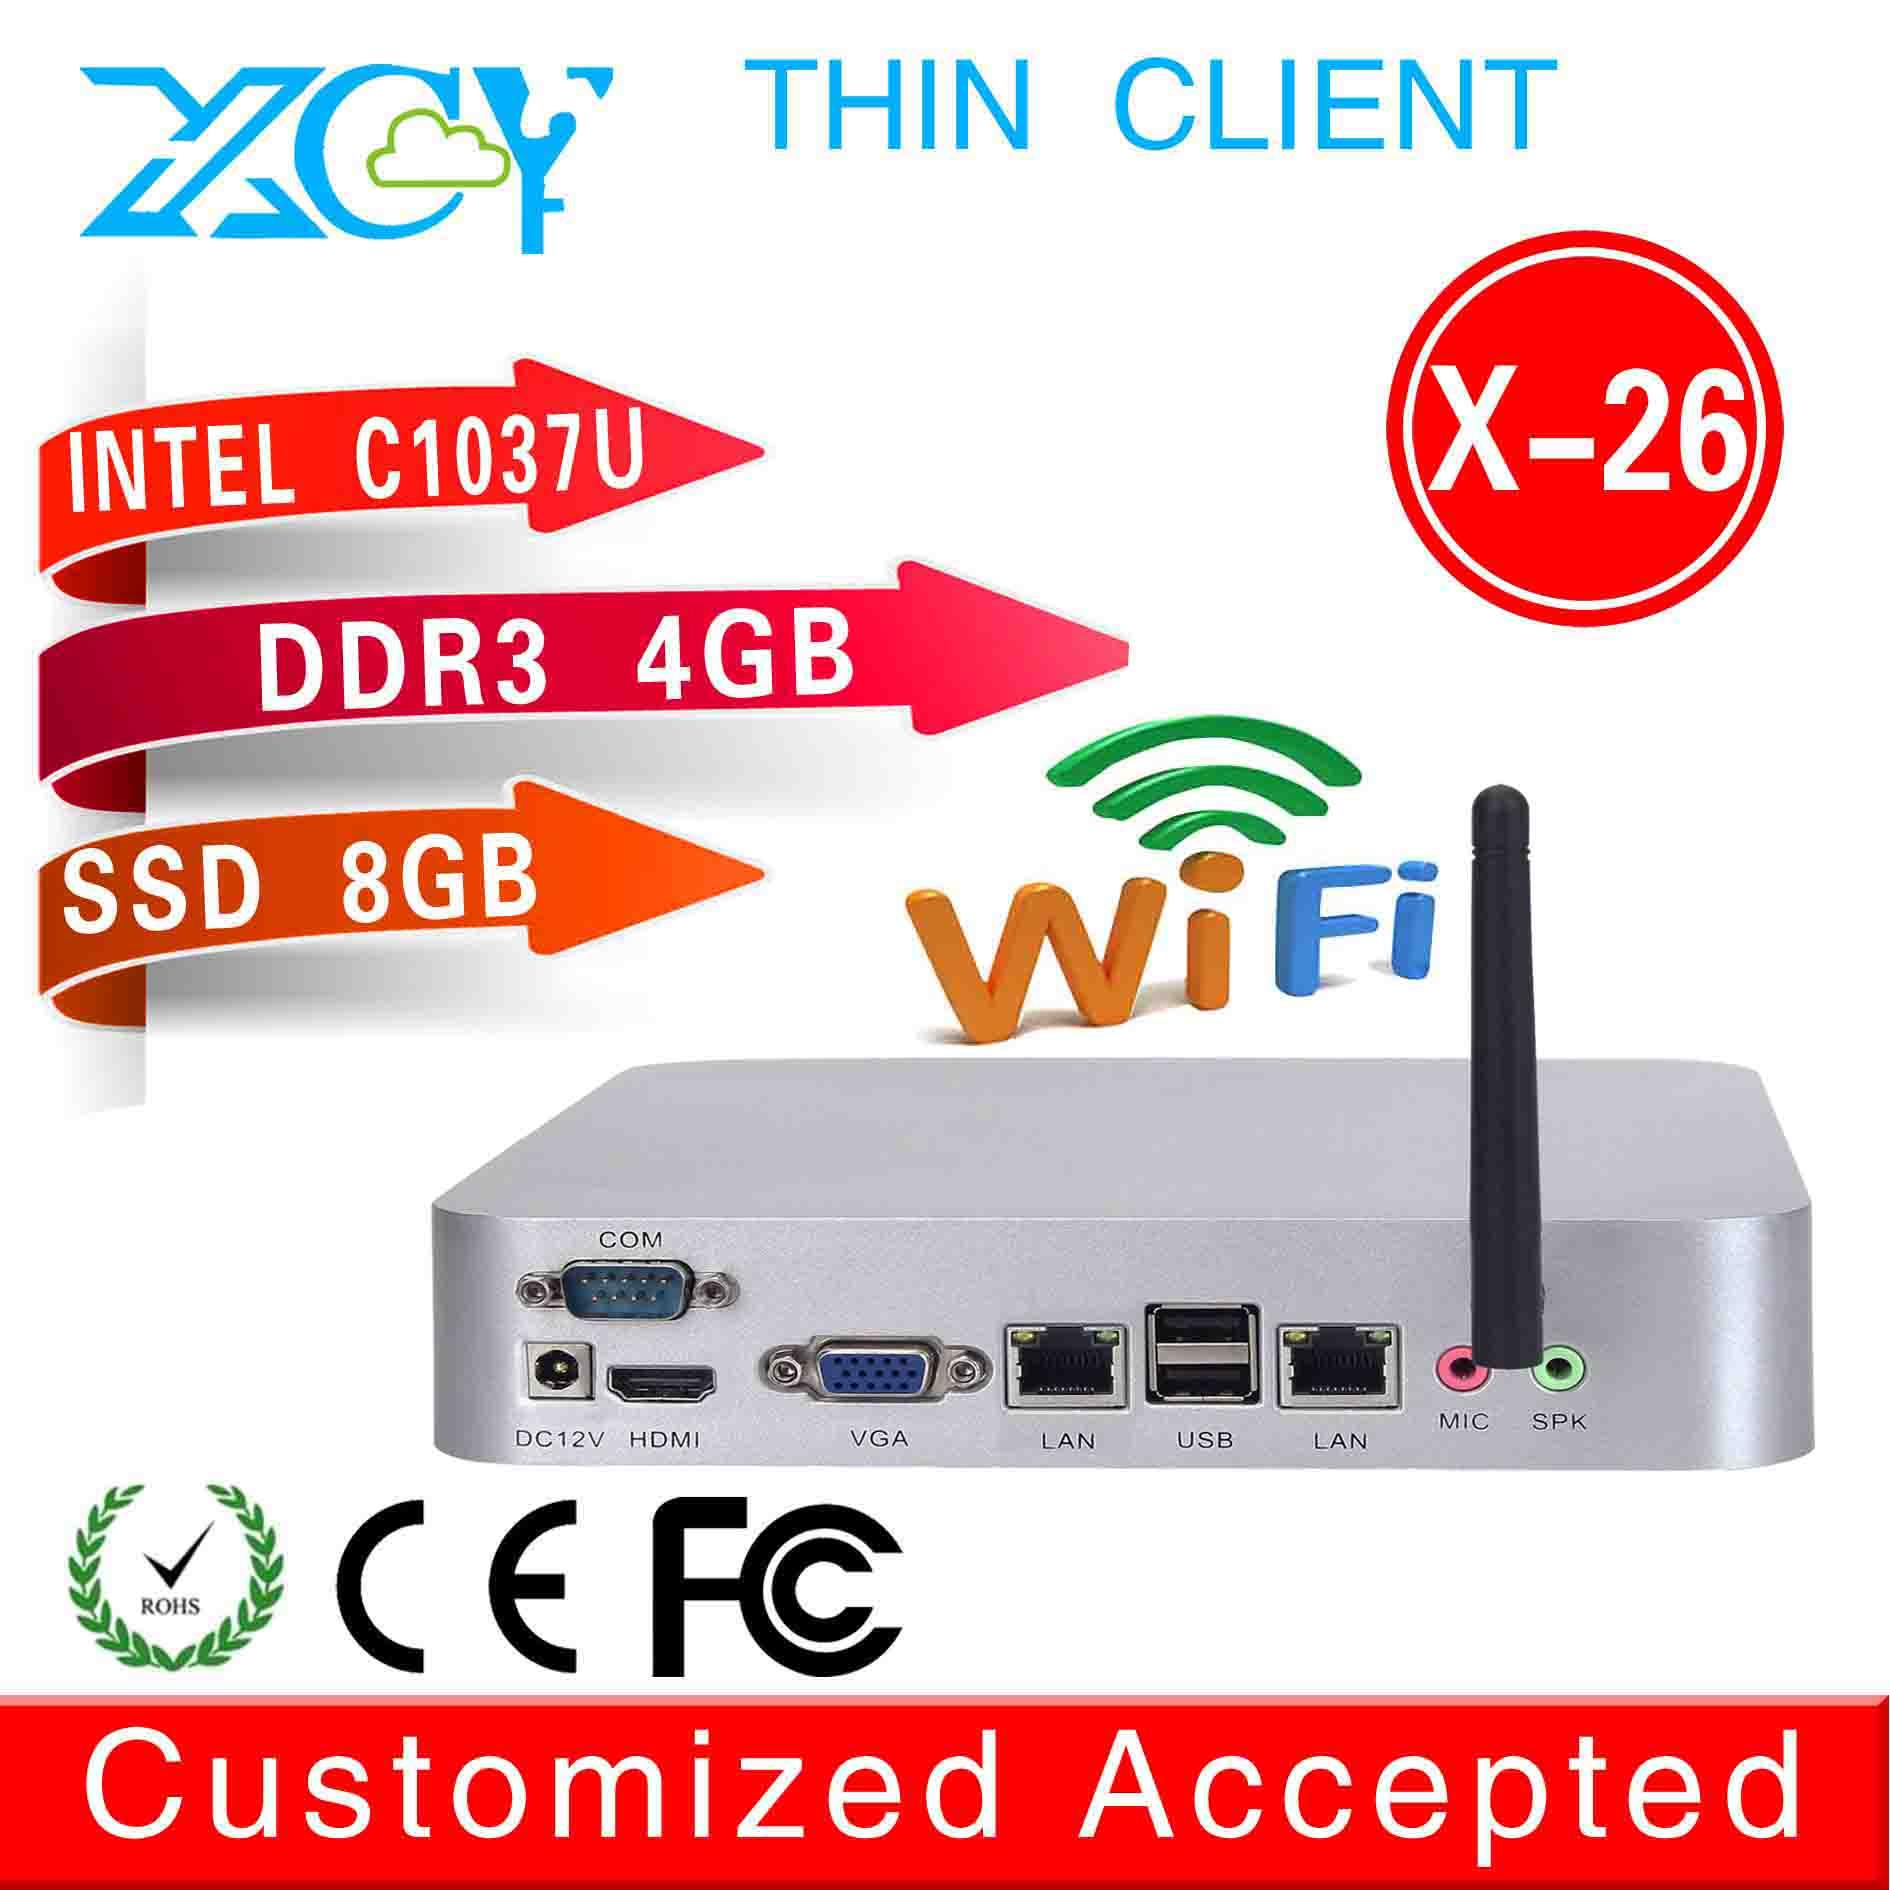 2015 all-powerful linux home preminum x-26 1037u dual core 2 lan thin client 4g ram 8g ssd fan desktop ABS x86 mini pc server(China (Mainland))